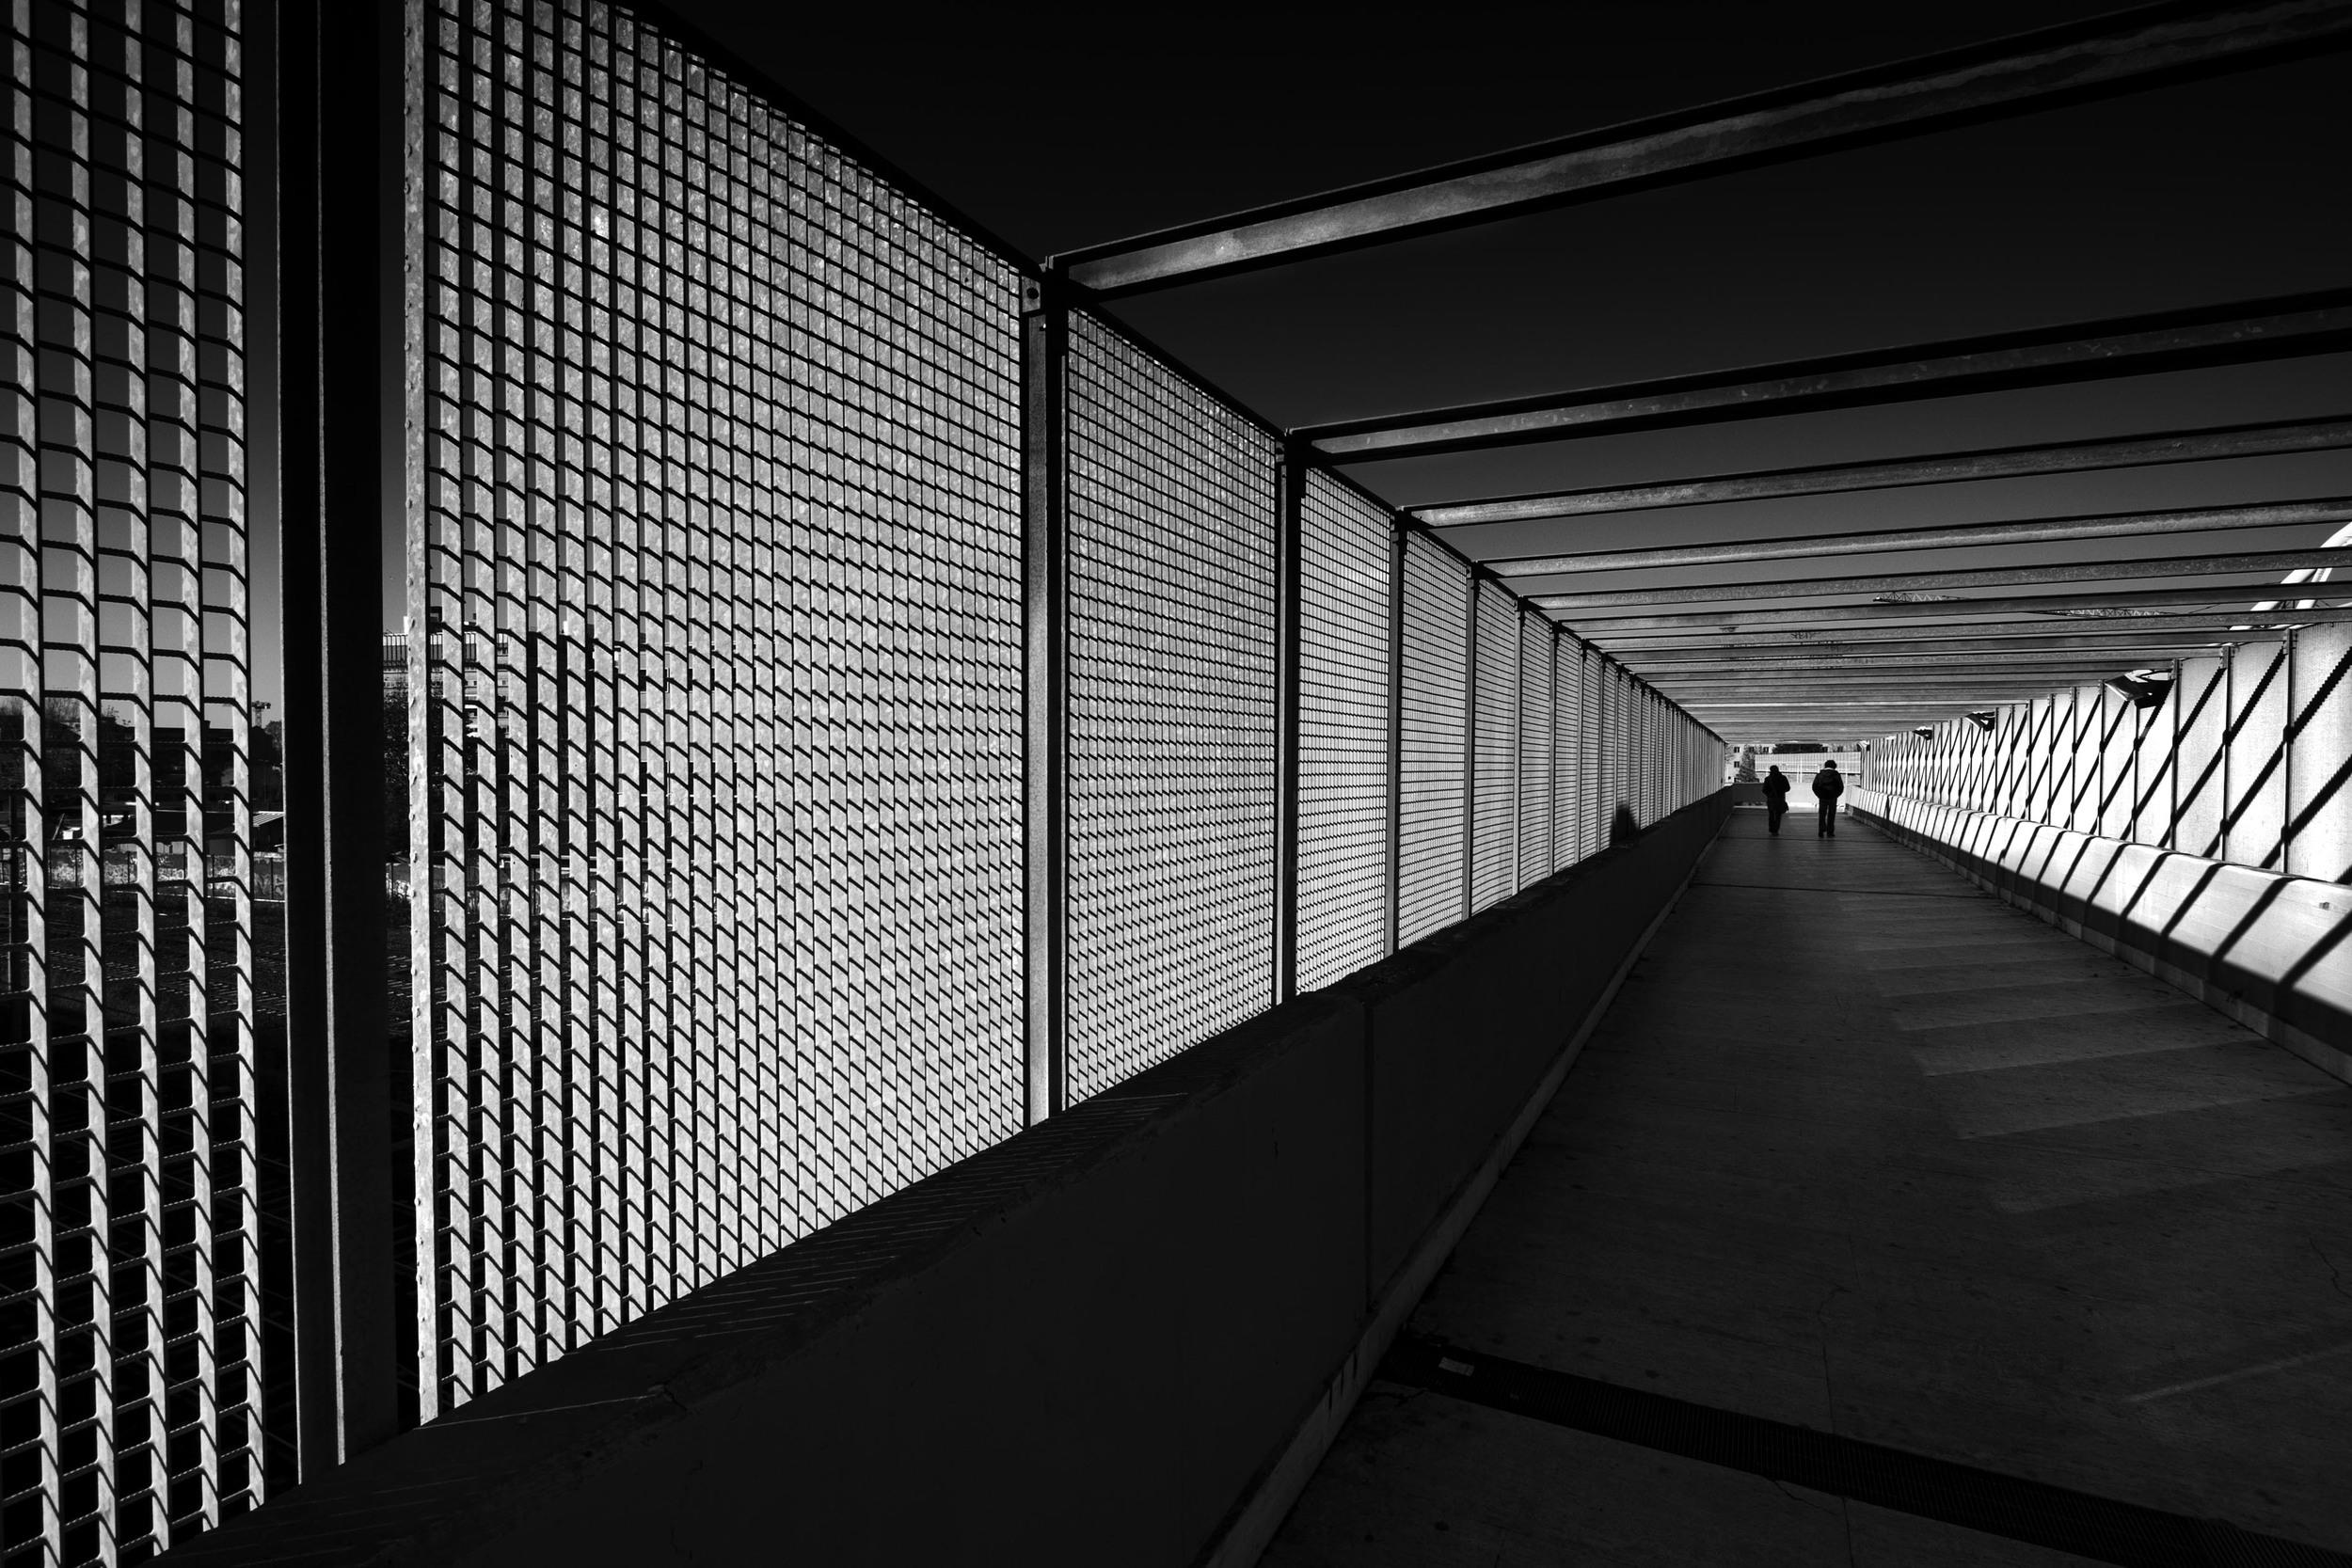 tunnel copy.jpg